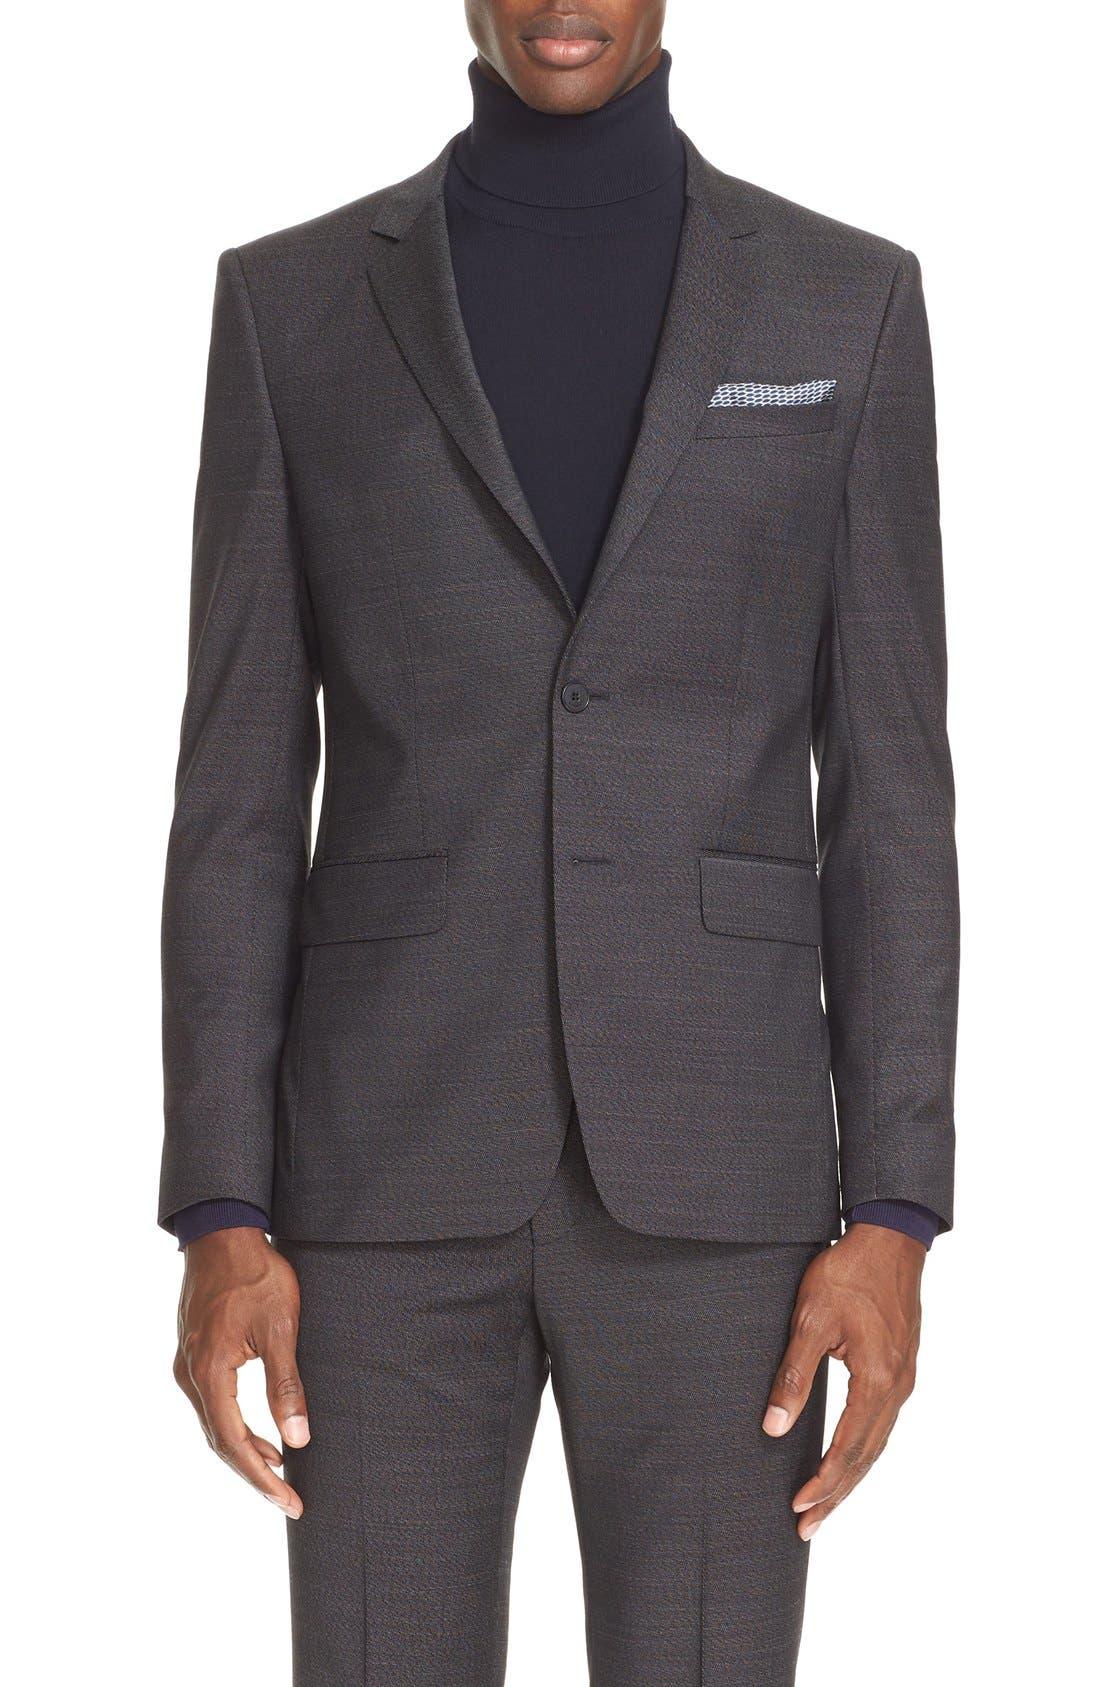 Extra Trim Fit Textured Wool Suit,                             Alternate thumbnail 5, color,                             Black